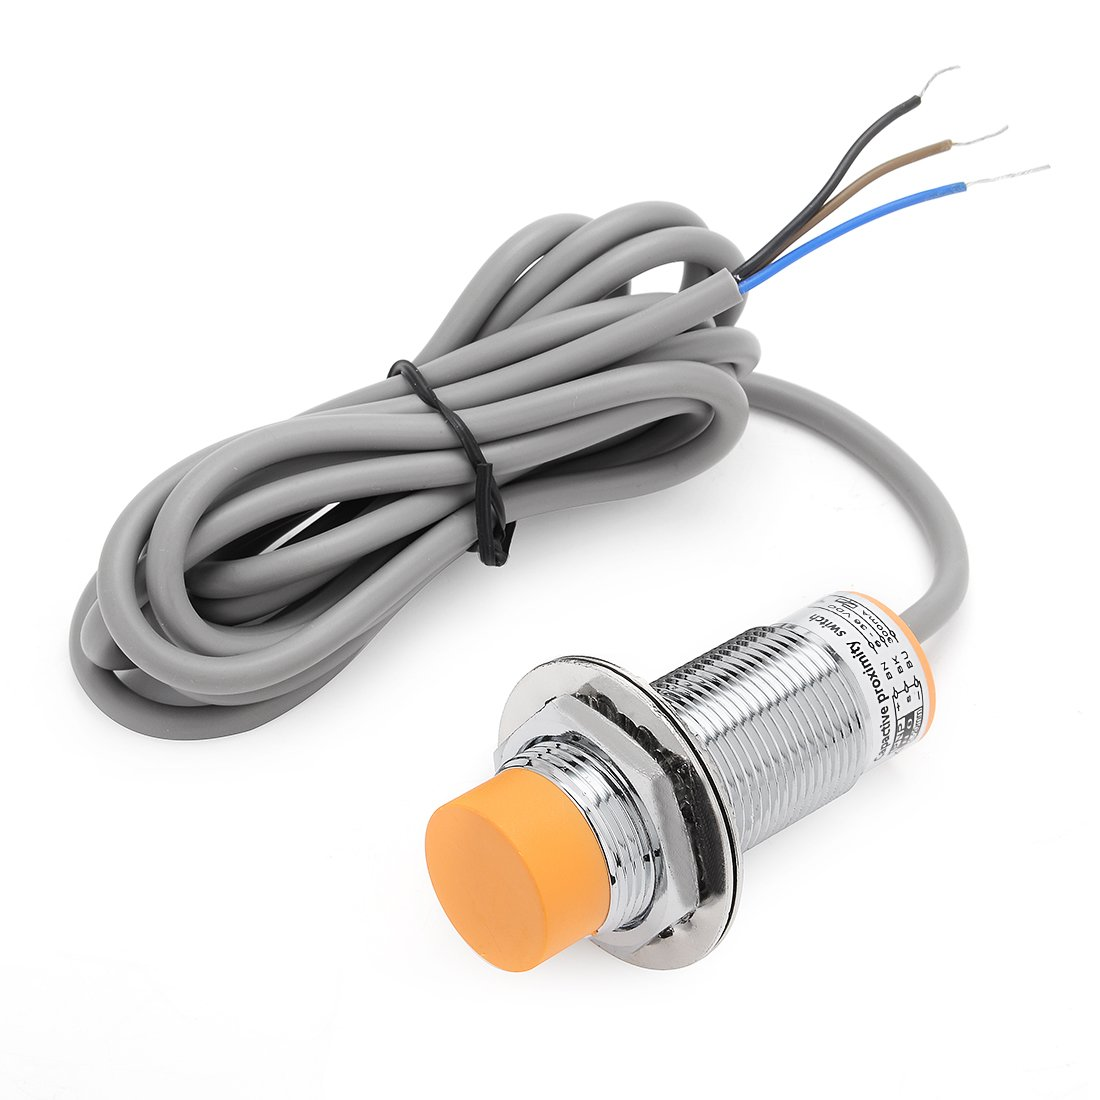 uxcell LJC24A3-T-Z/BY 1-15mm Capacitance Proximity Sensor Switch PNP NO DC 6-36V 300mA